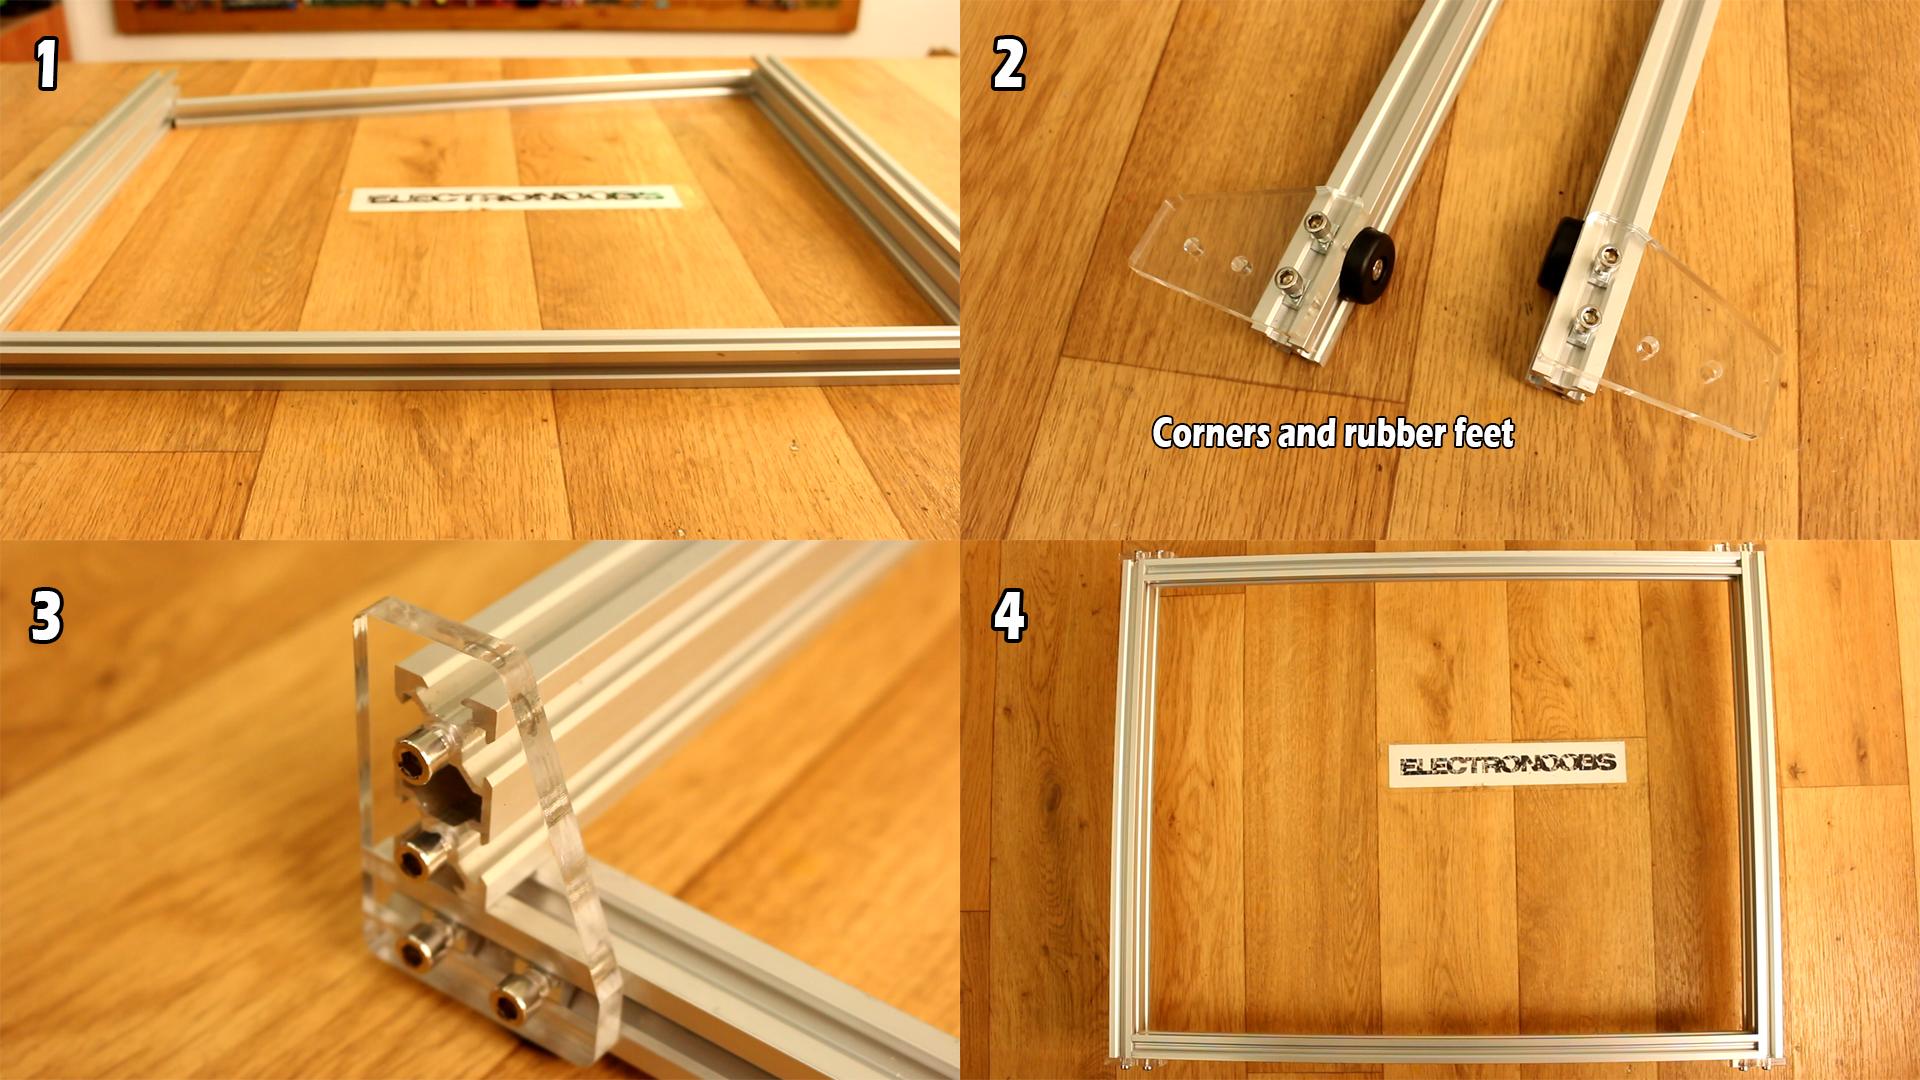 Eleksmaker A3 benbox elekscam software review laser assemble guide